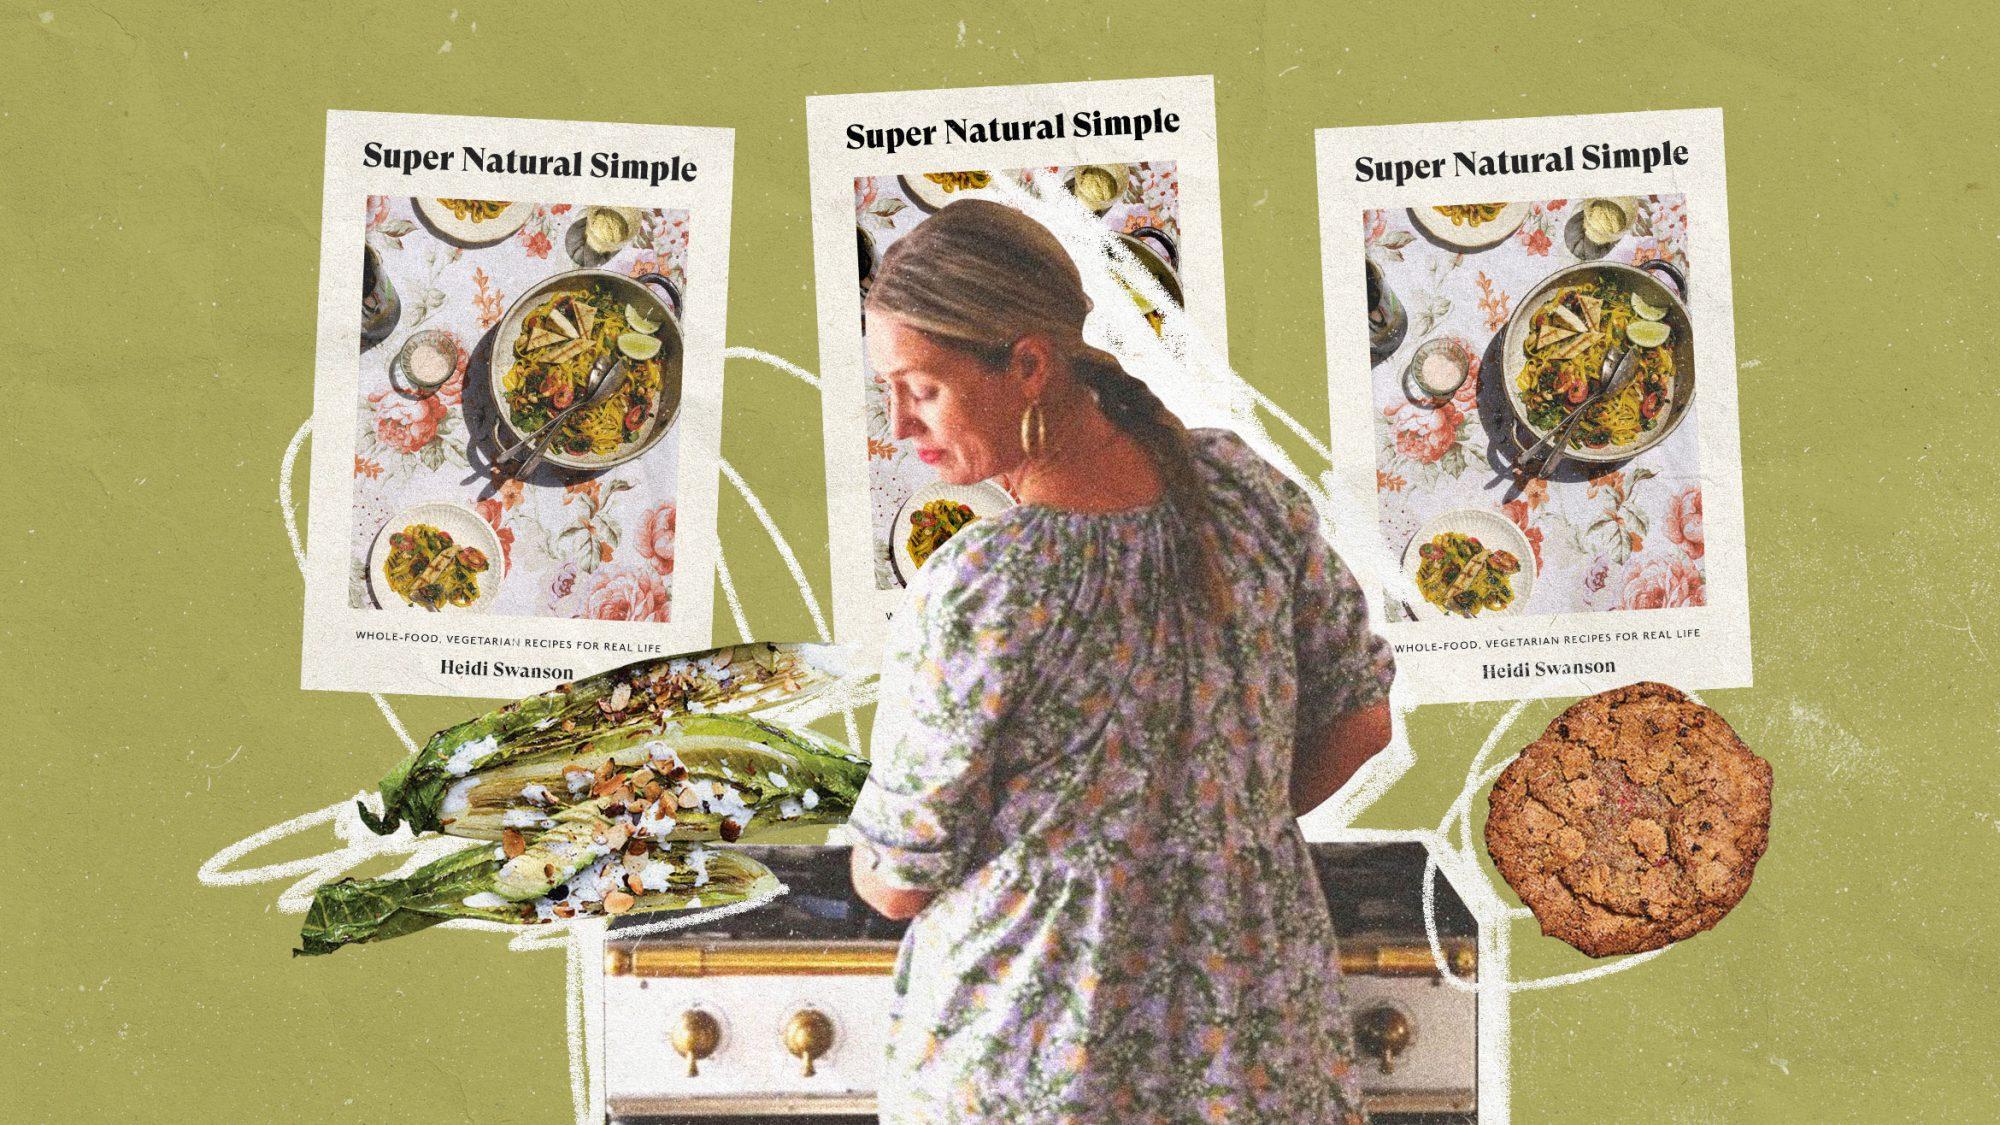 Article-Heidi-Swanson-Super-Natural-Simple